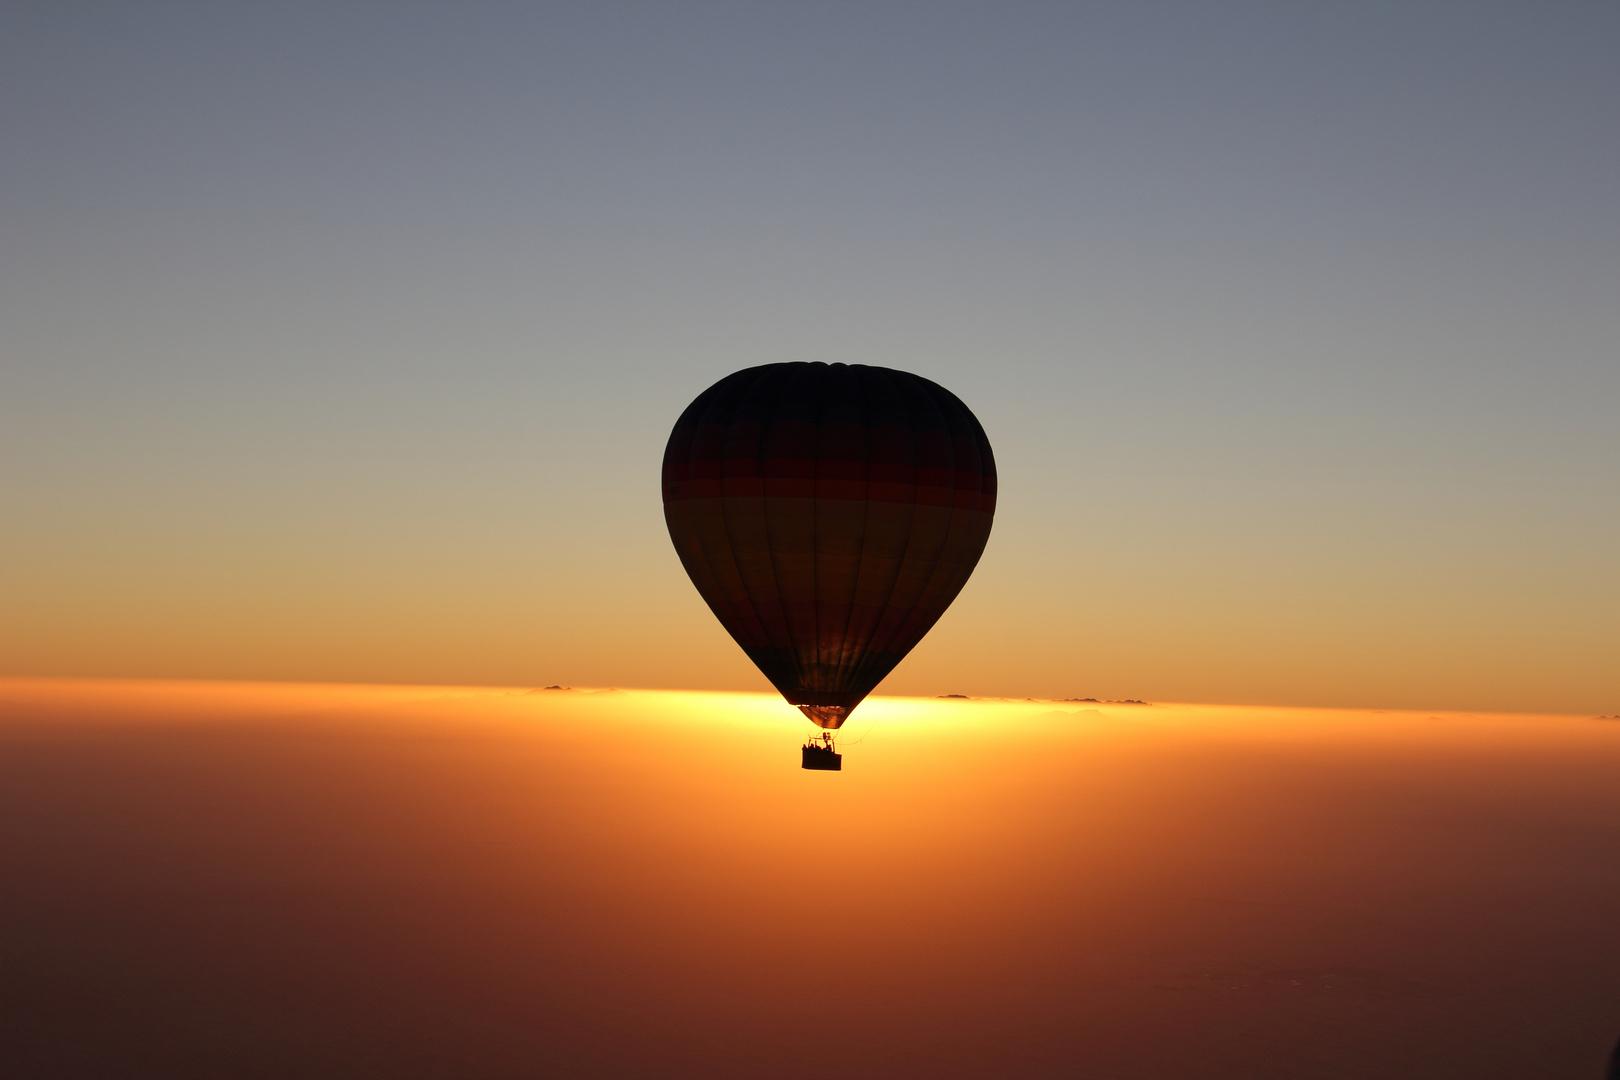 Ballooning in Dubai